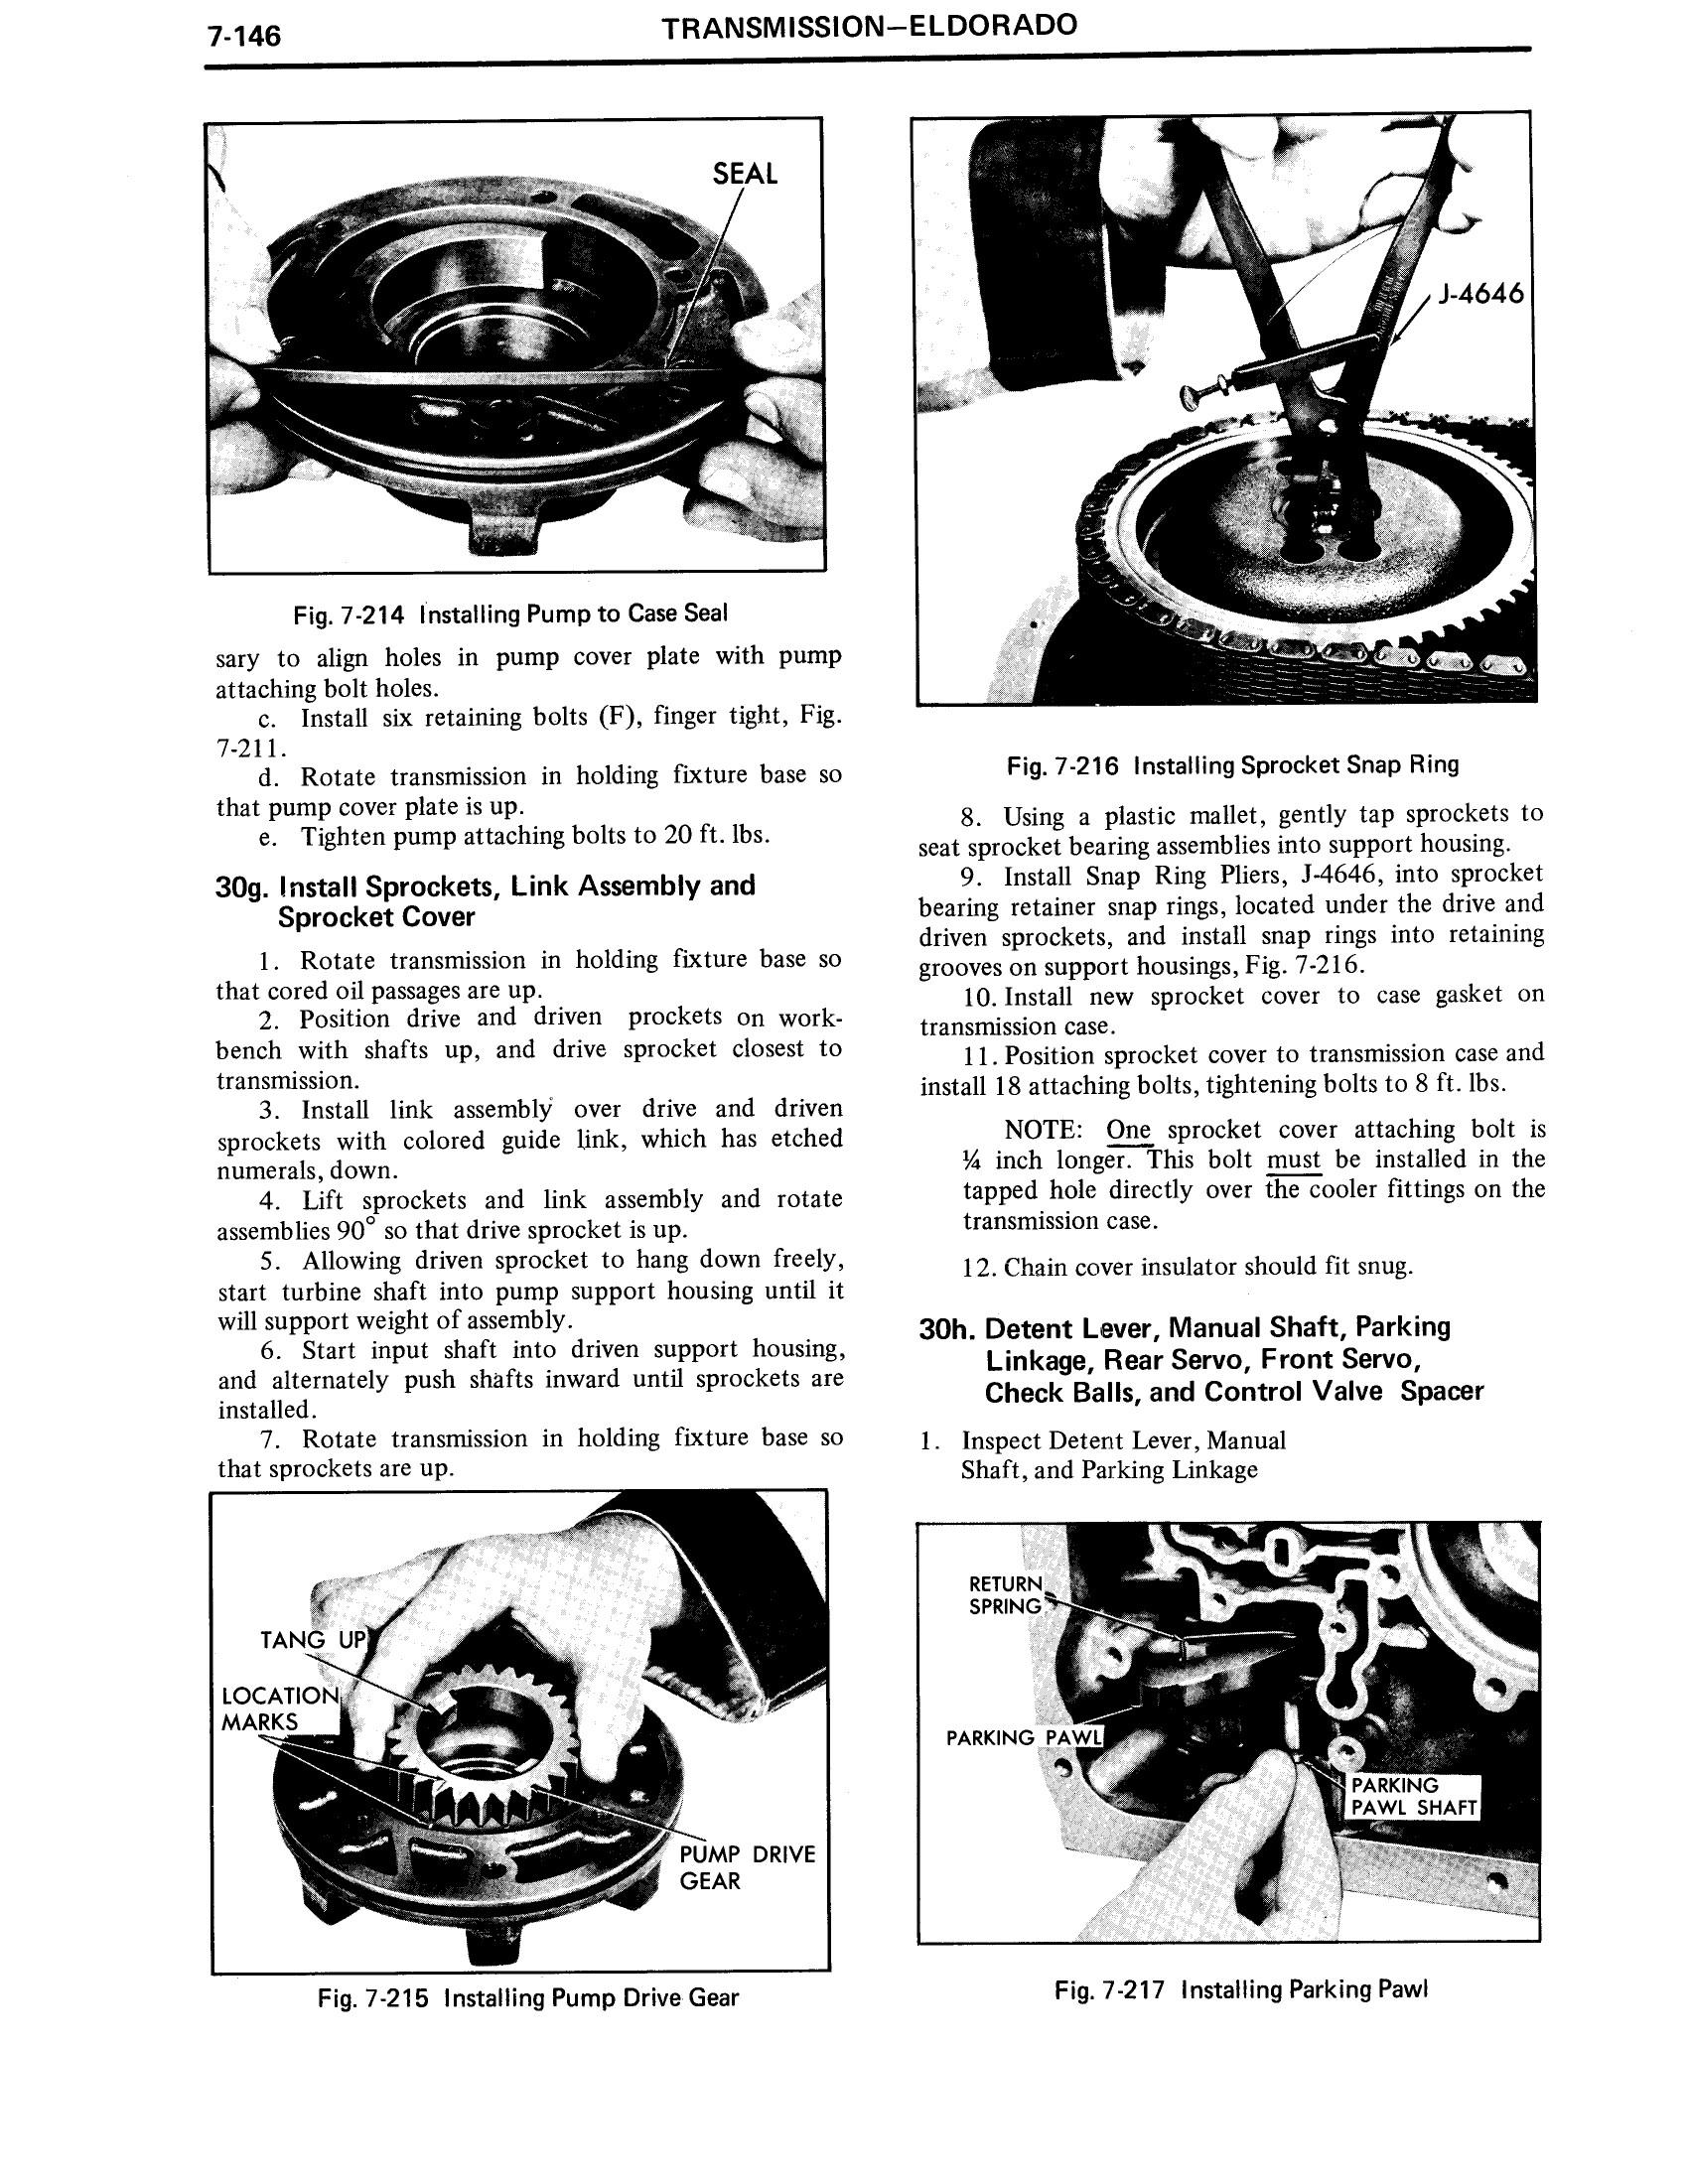 1971 Cadillac Shop Manual- Transmission Page 146 of 156